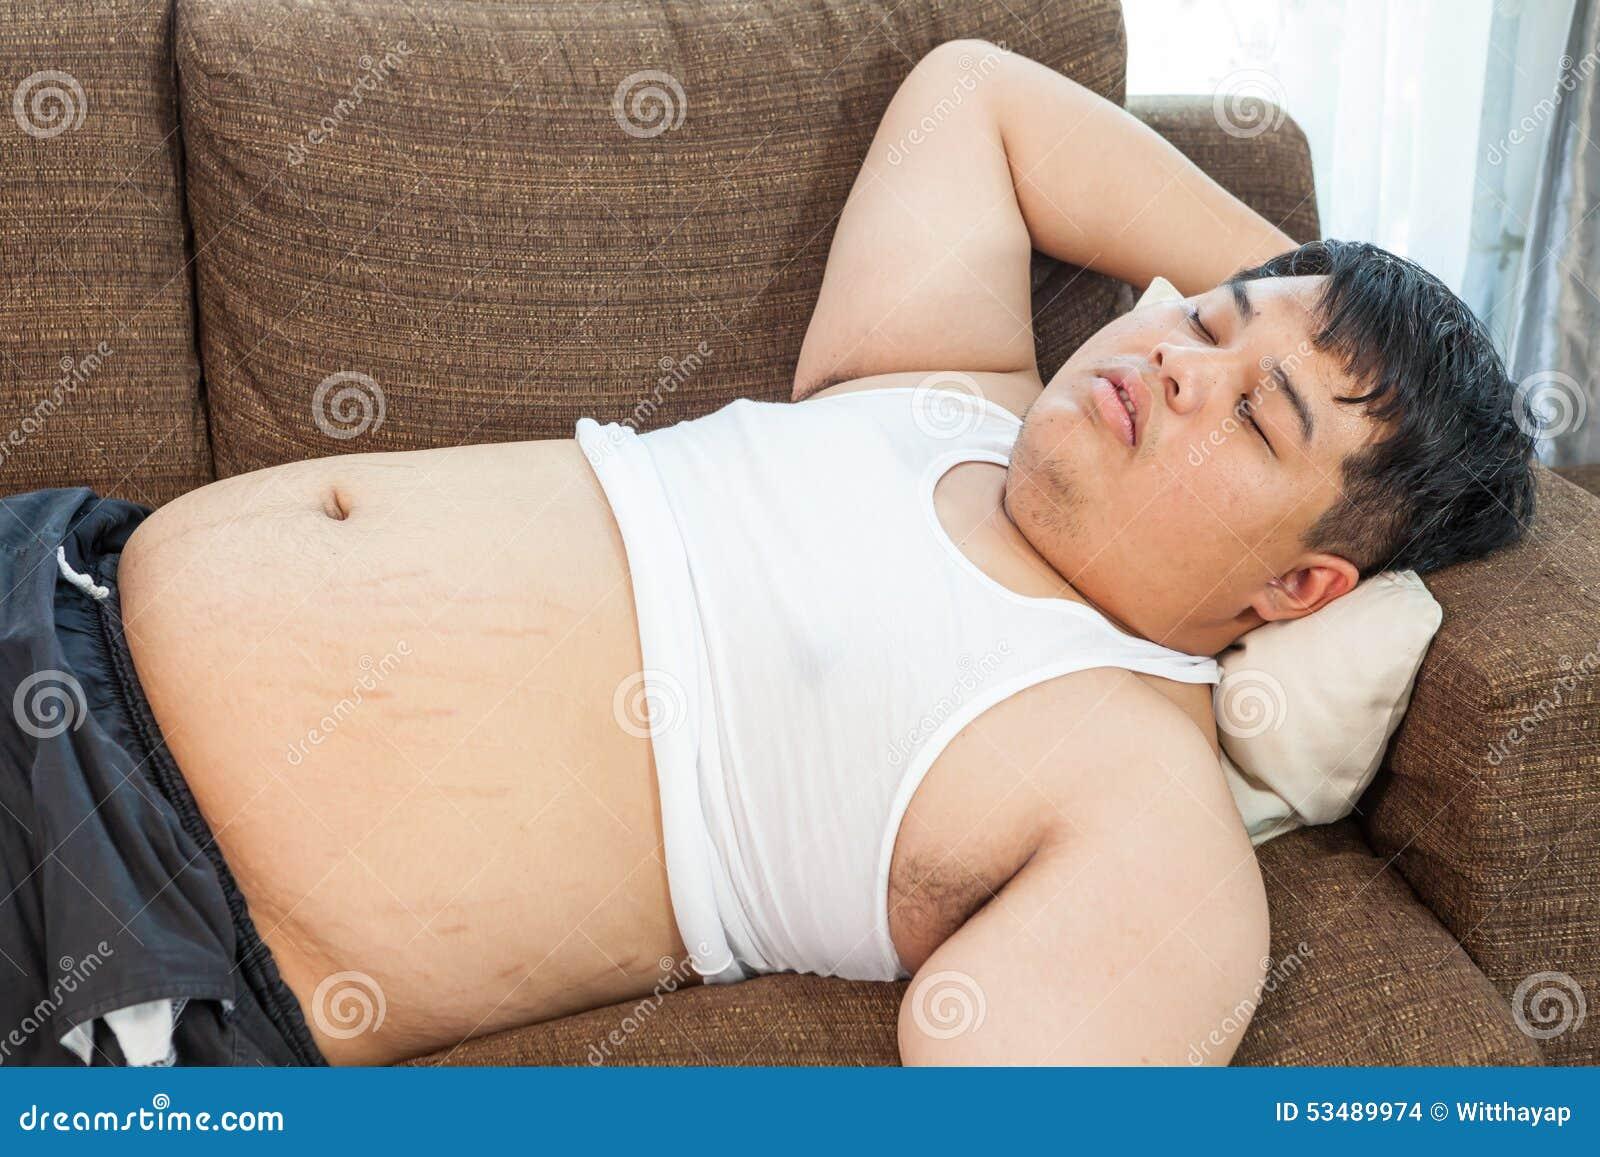 Japan fat man chubby